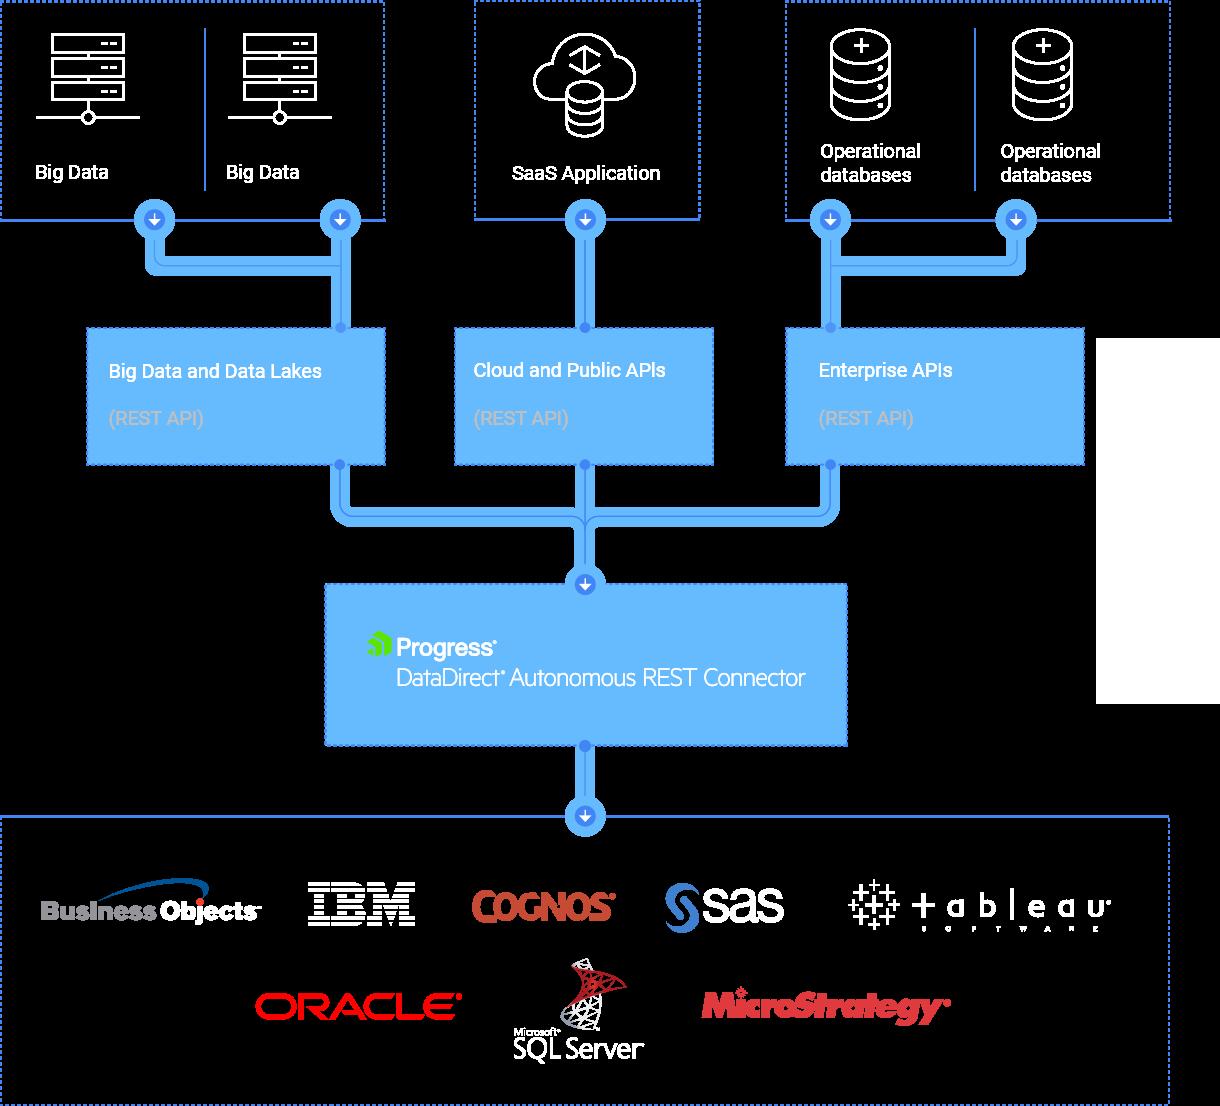 Progress' DataDirect Autonomous REST Connector, MariaDB Platform X3, and FoundationDB's Record Layer